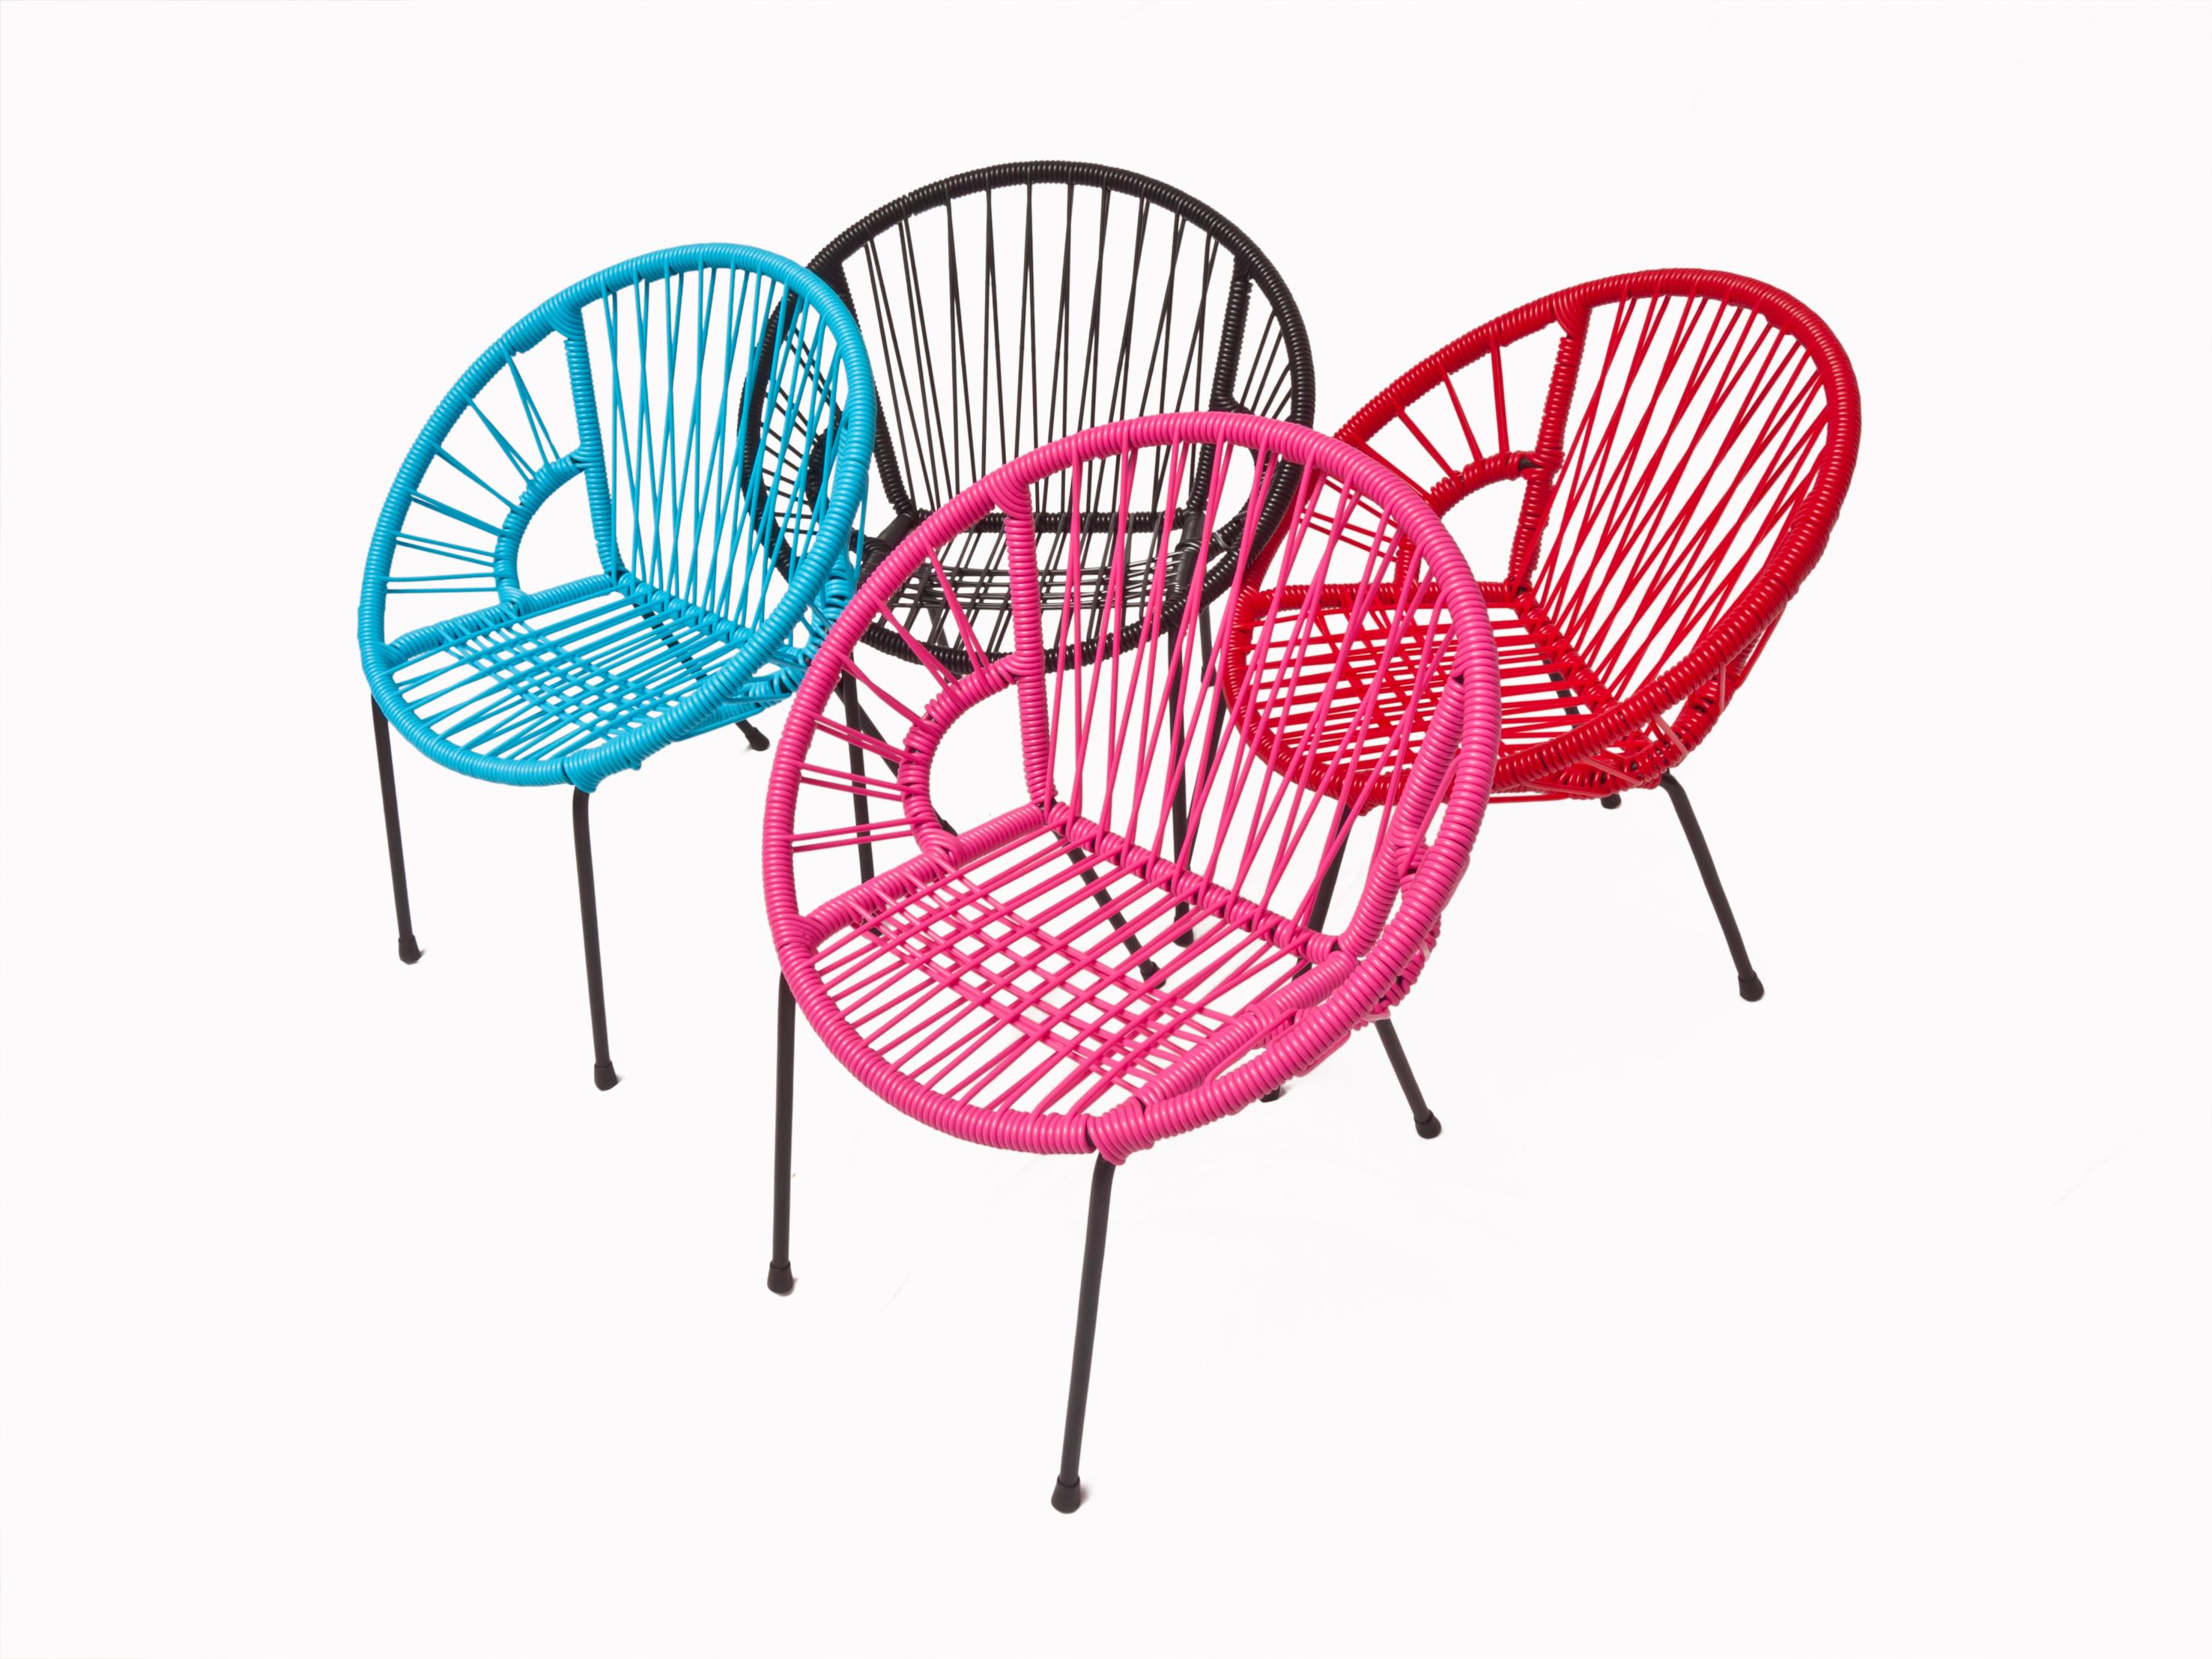 chaise tica scoubidou. Black Bedroom Furniture Sets. Home Design Ideas